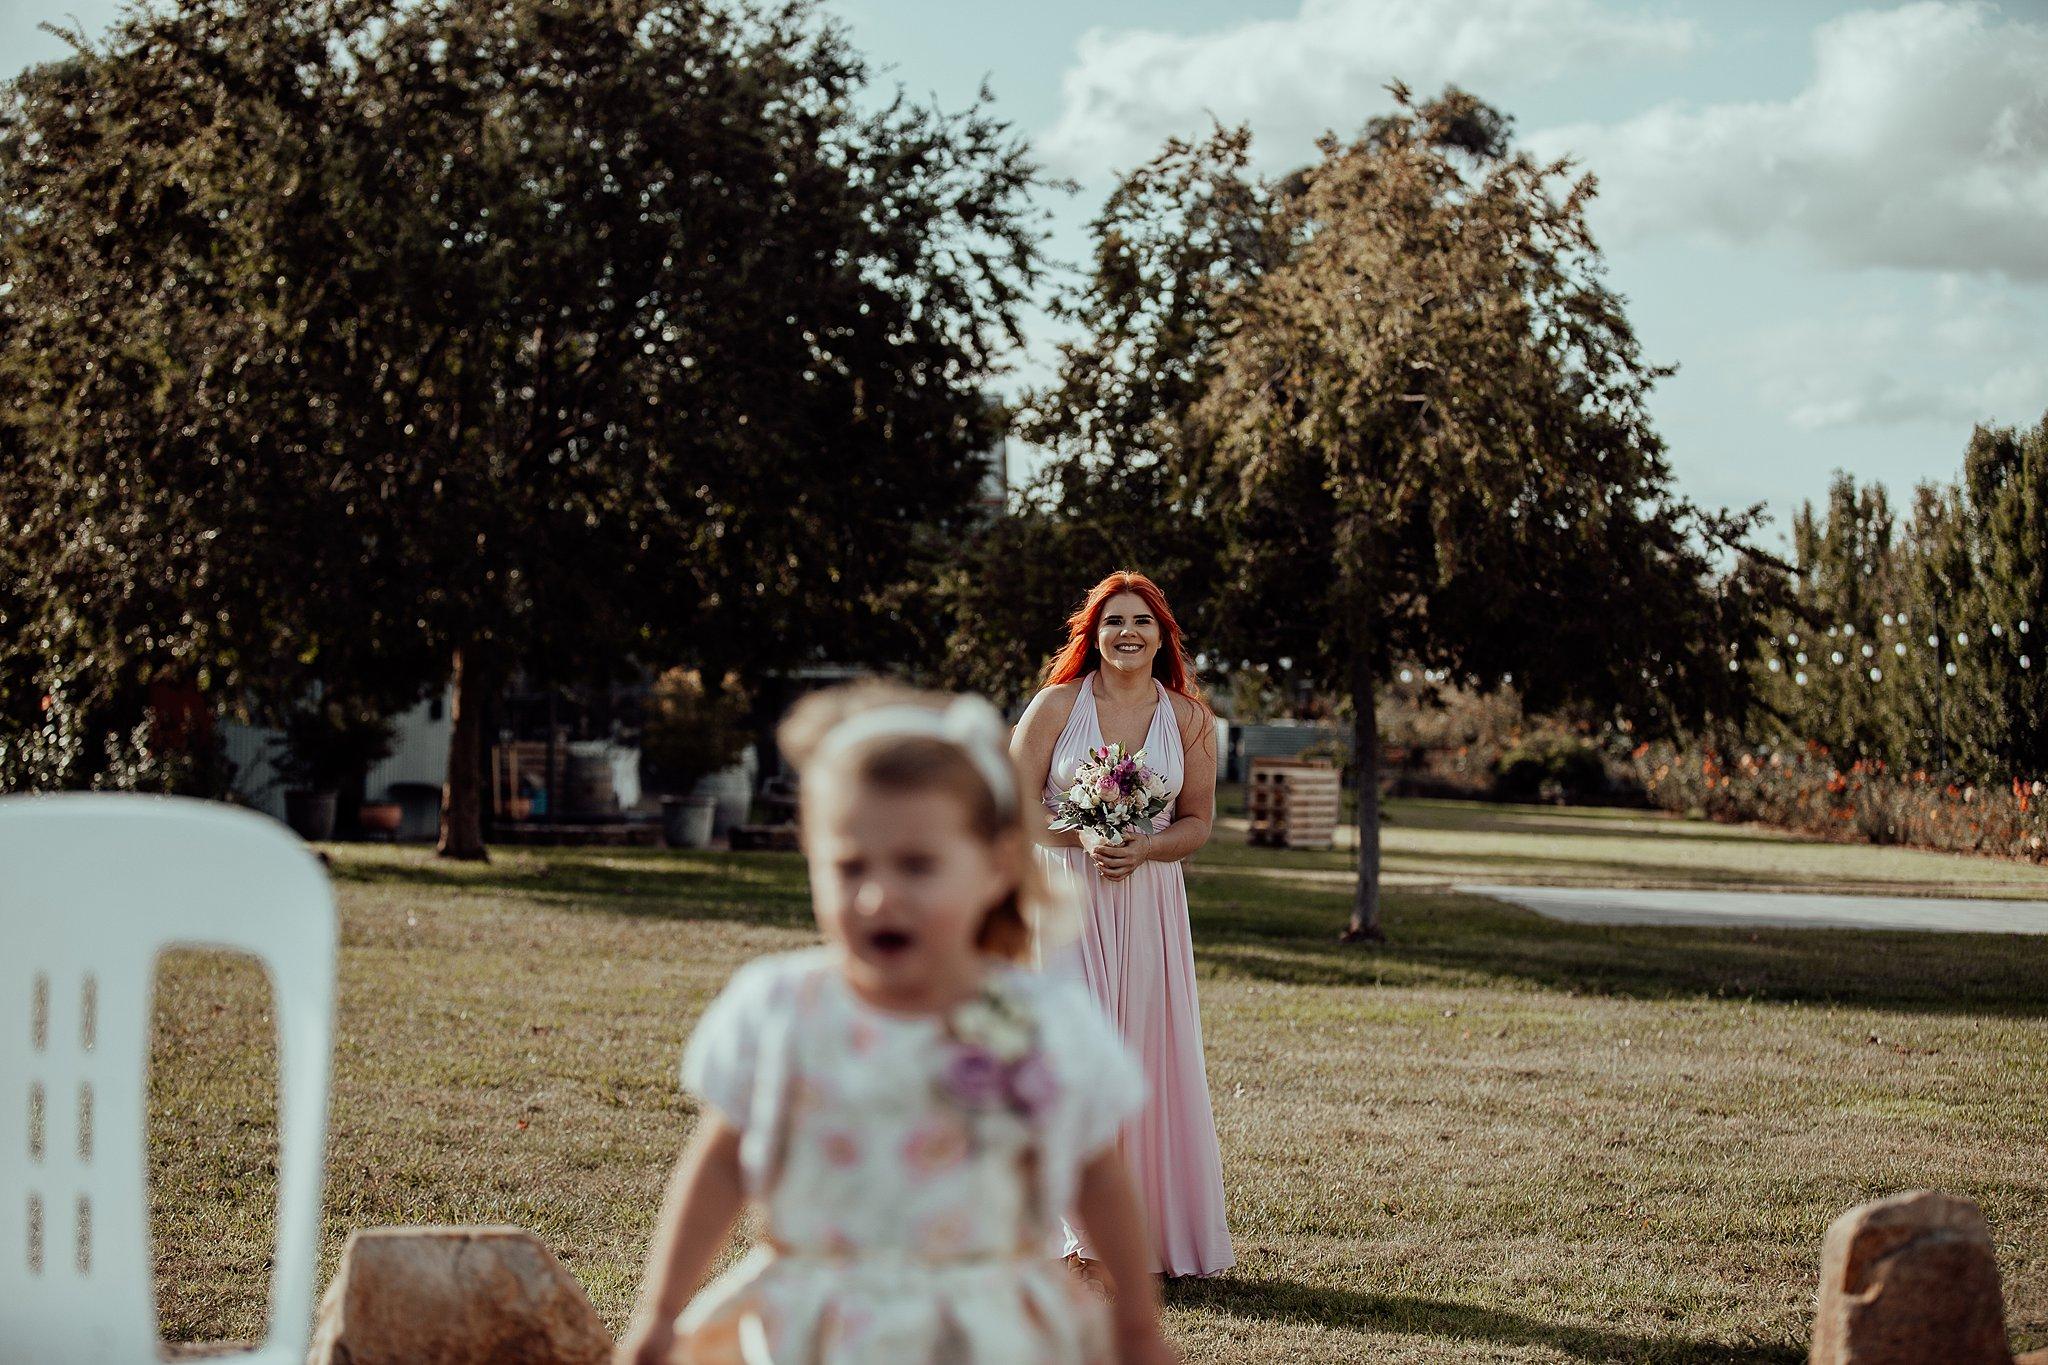 mickalathomas_puremacphotography_weddingphotographer_couplephotographer_Sheppartonphotographer_3422.jpg